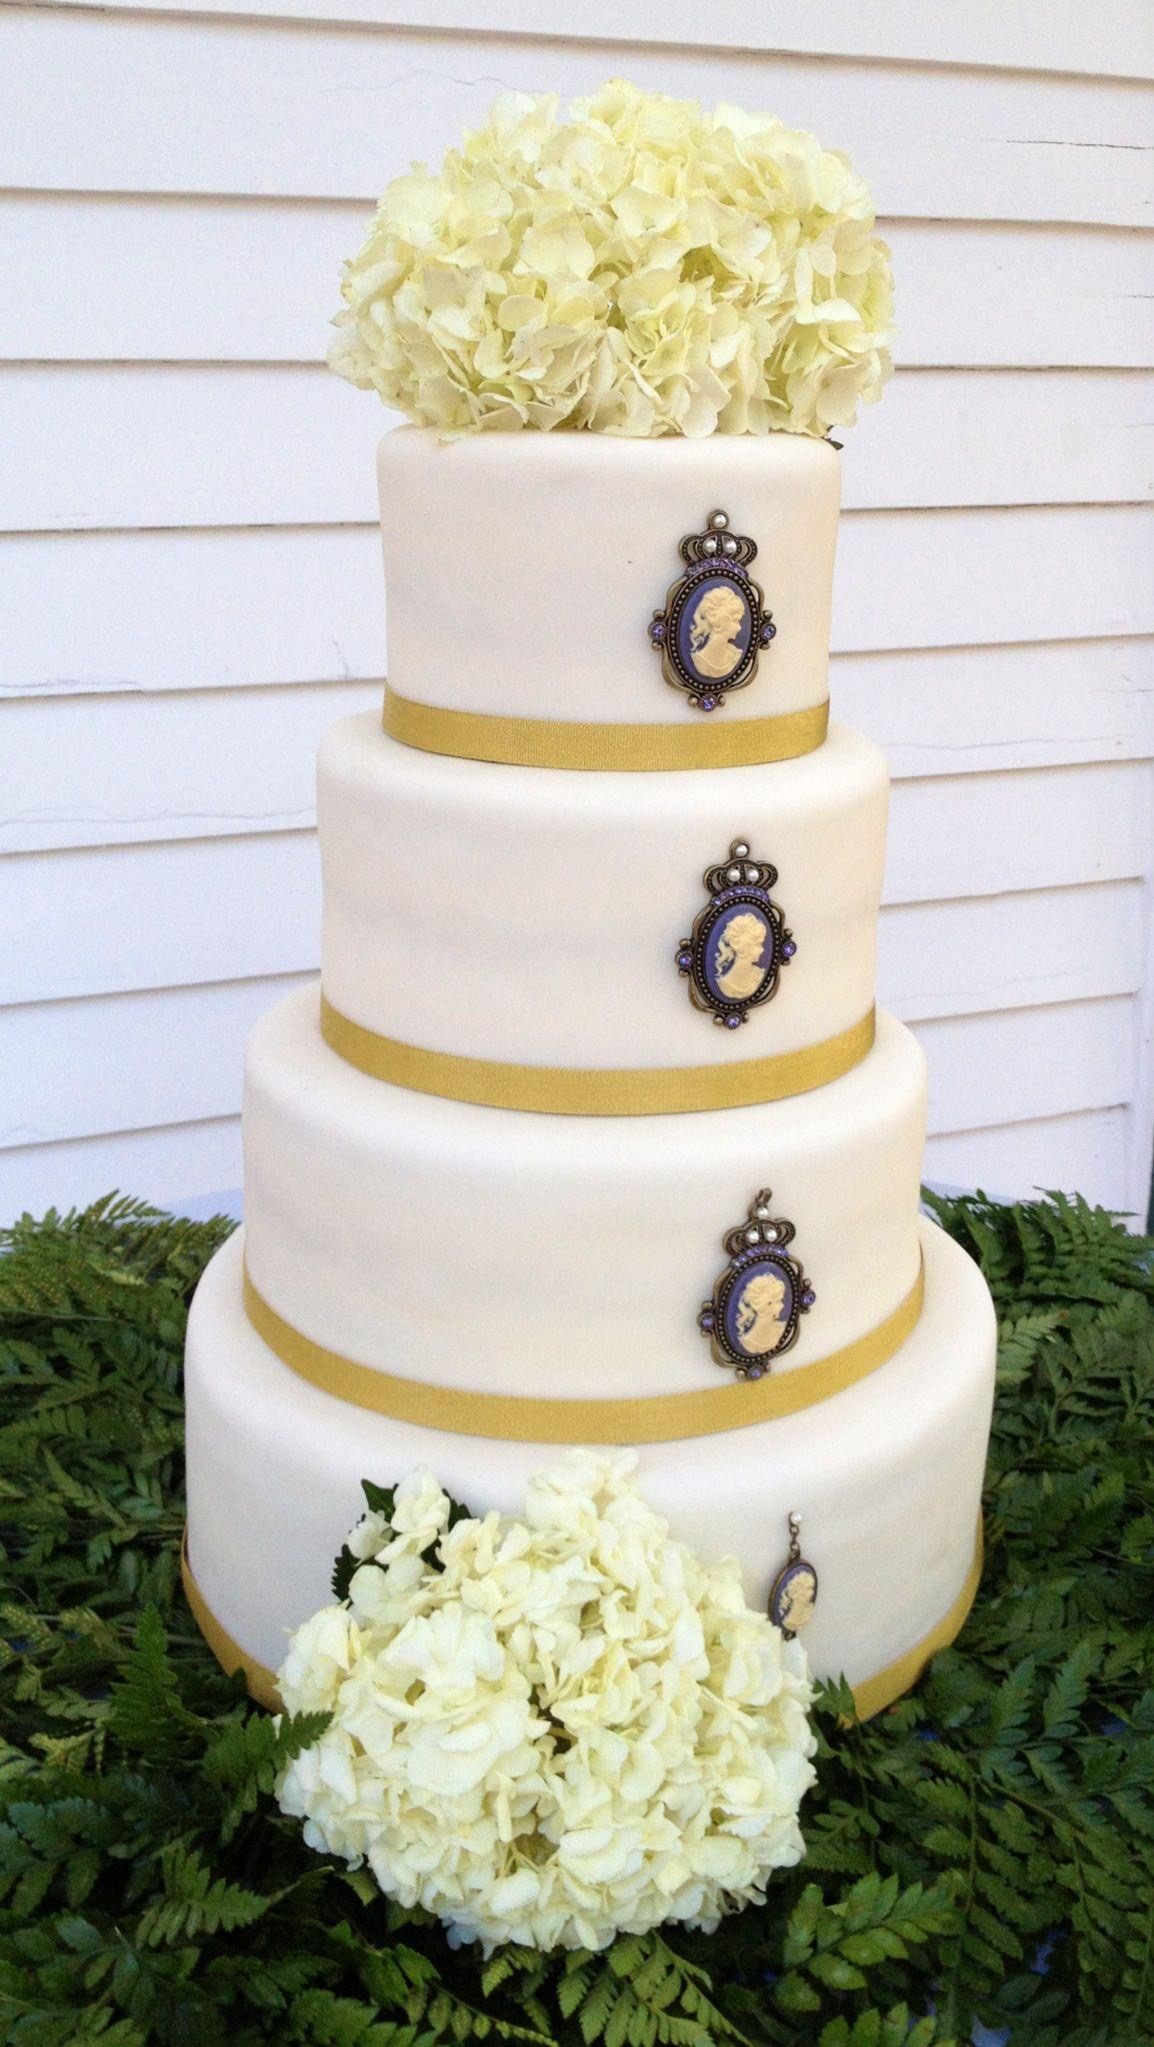 9 Tips When Shopping for Wedding Cakes